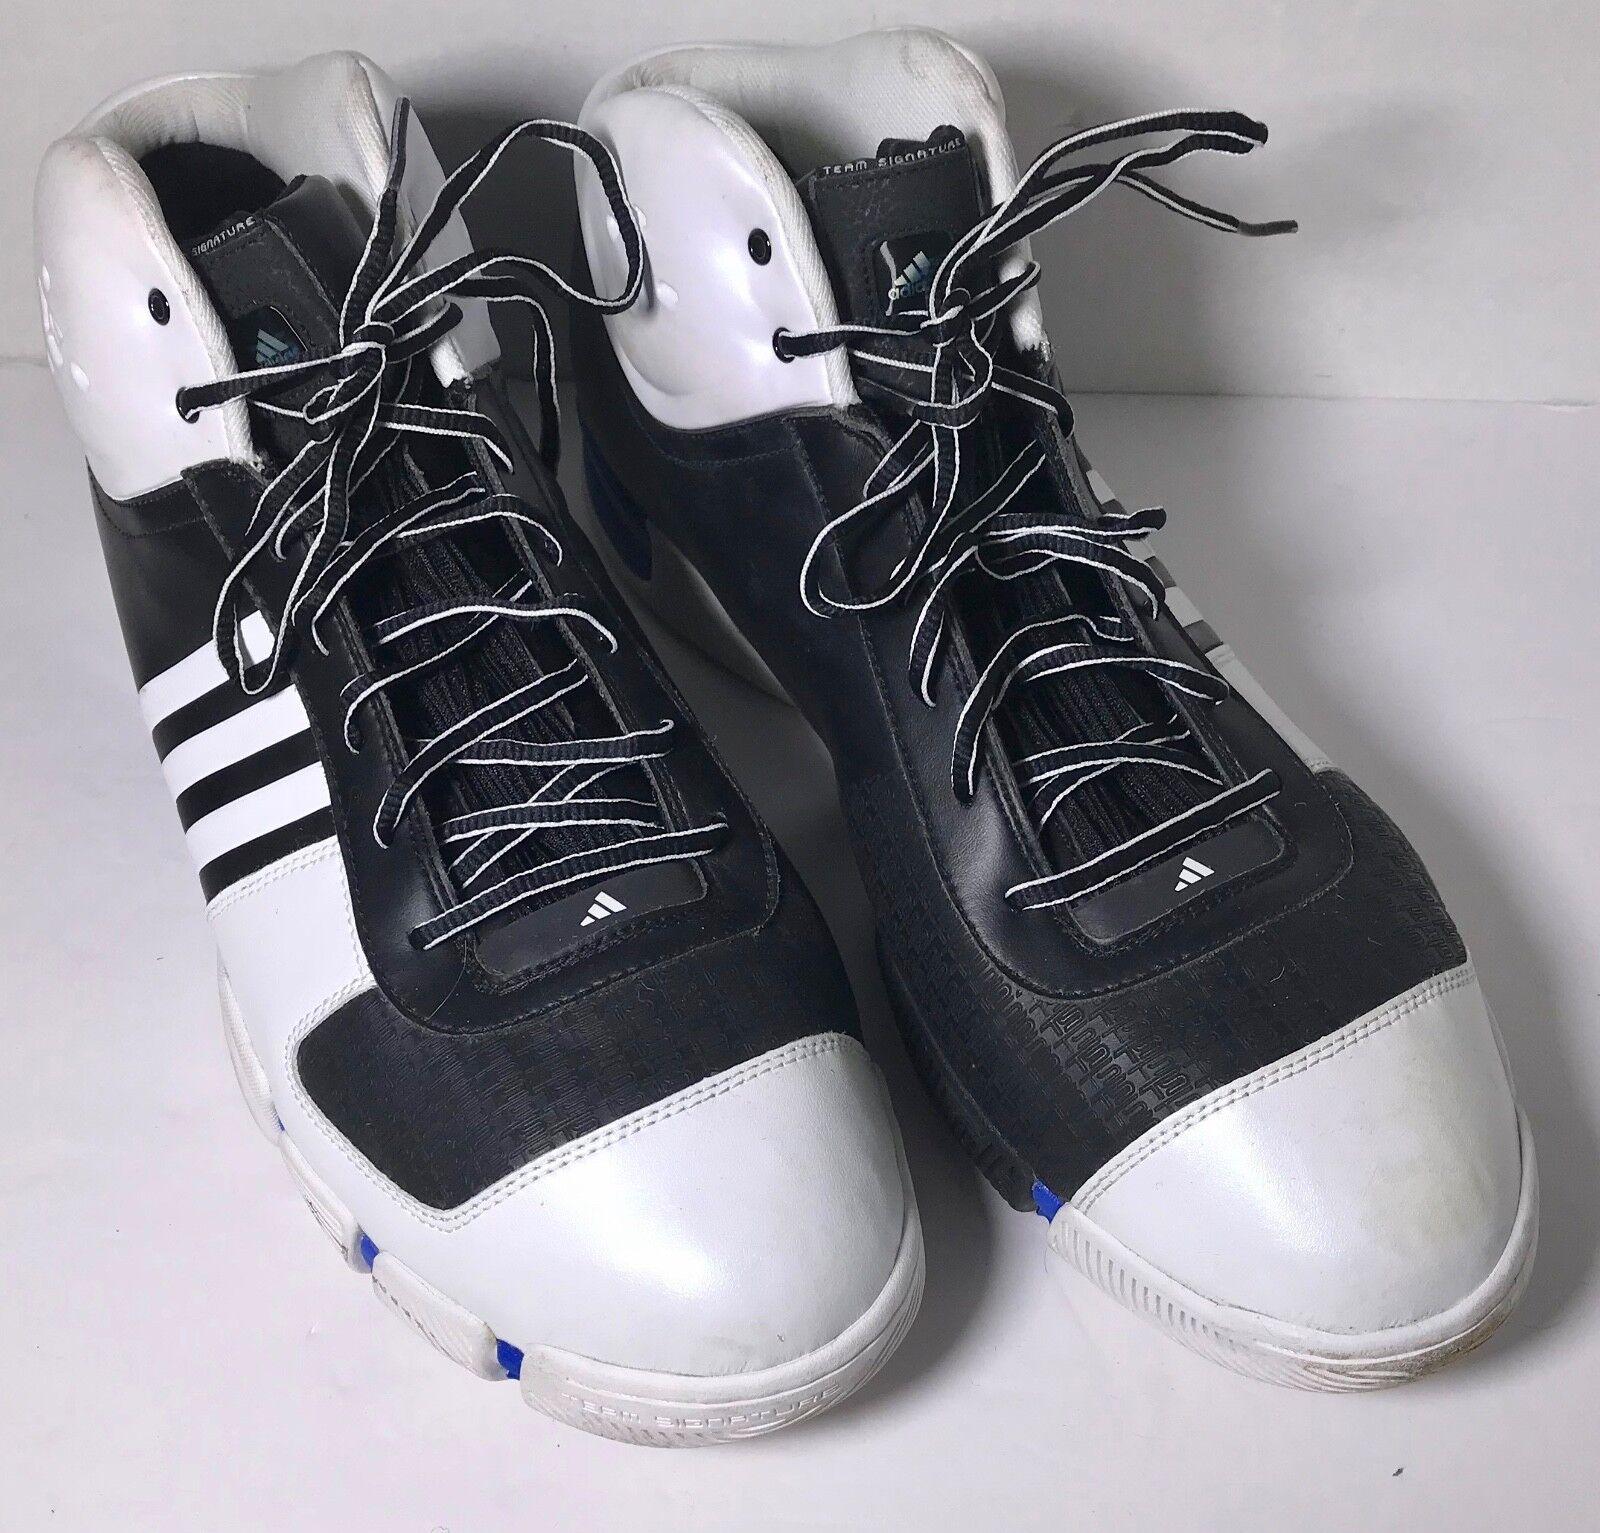 Adidas Men's Black/White TS BELIEVE Shoes 20